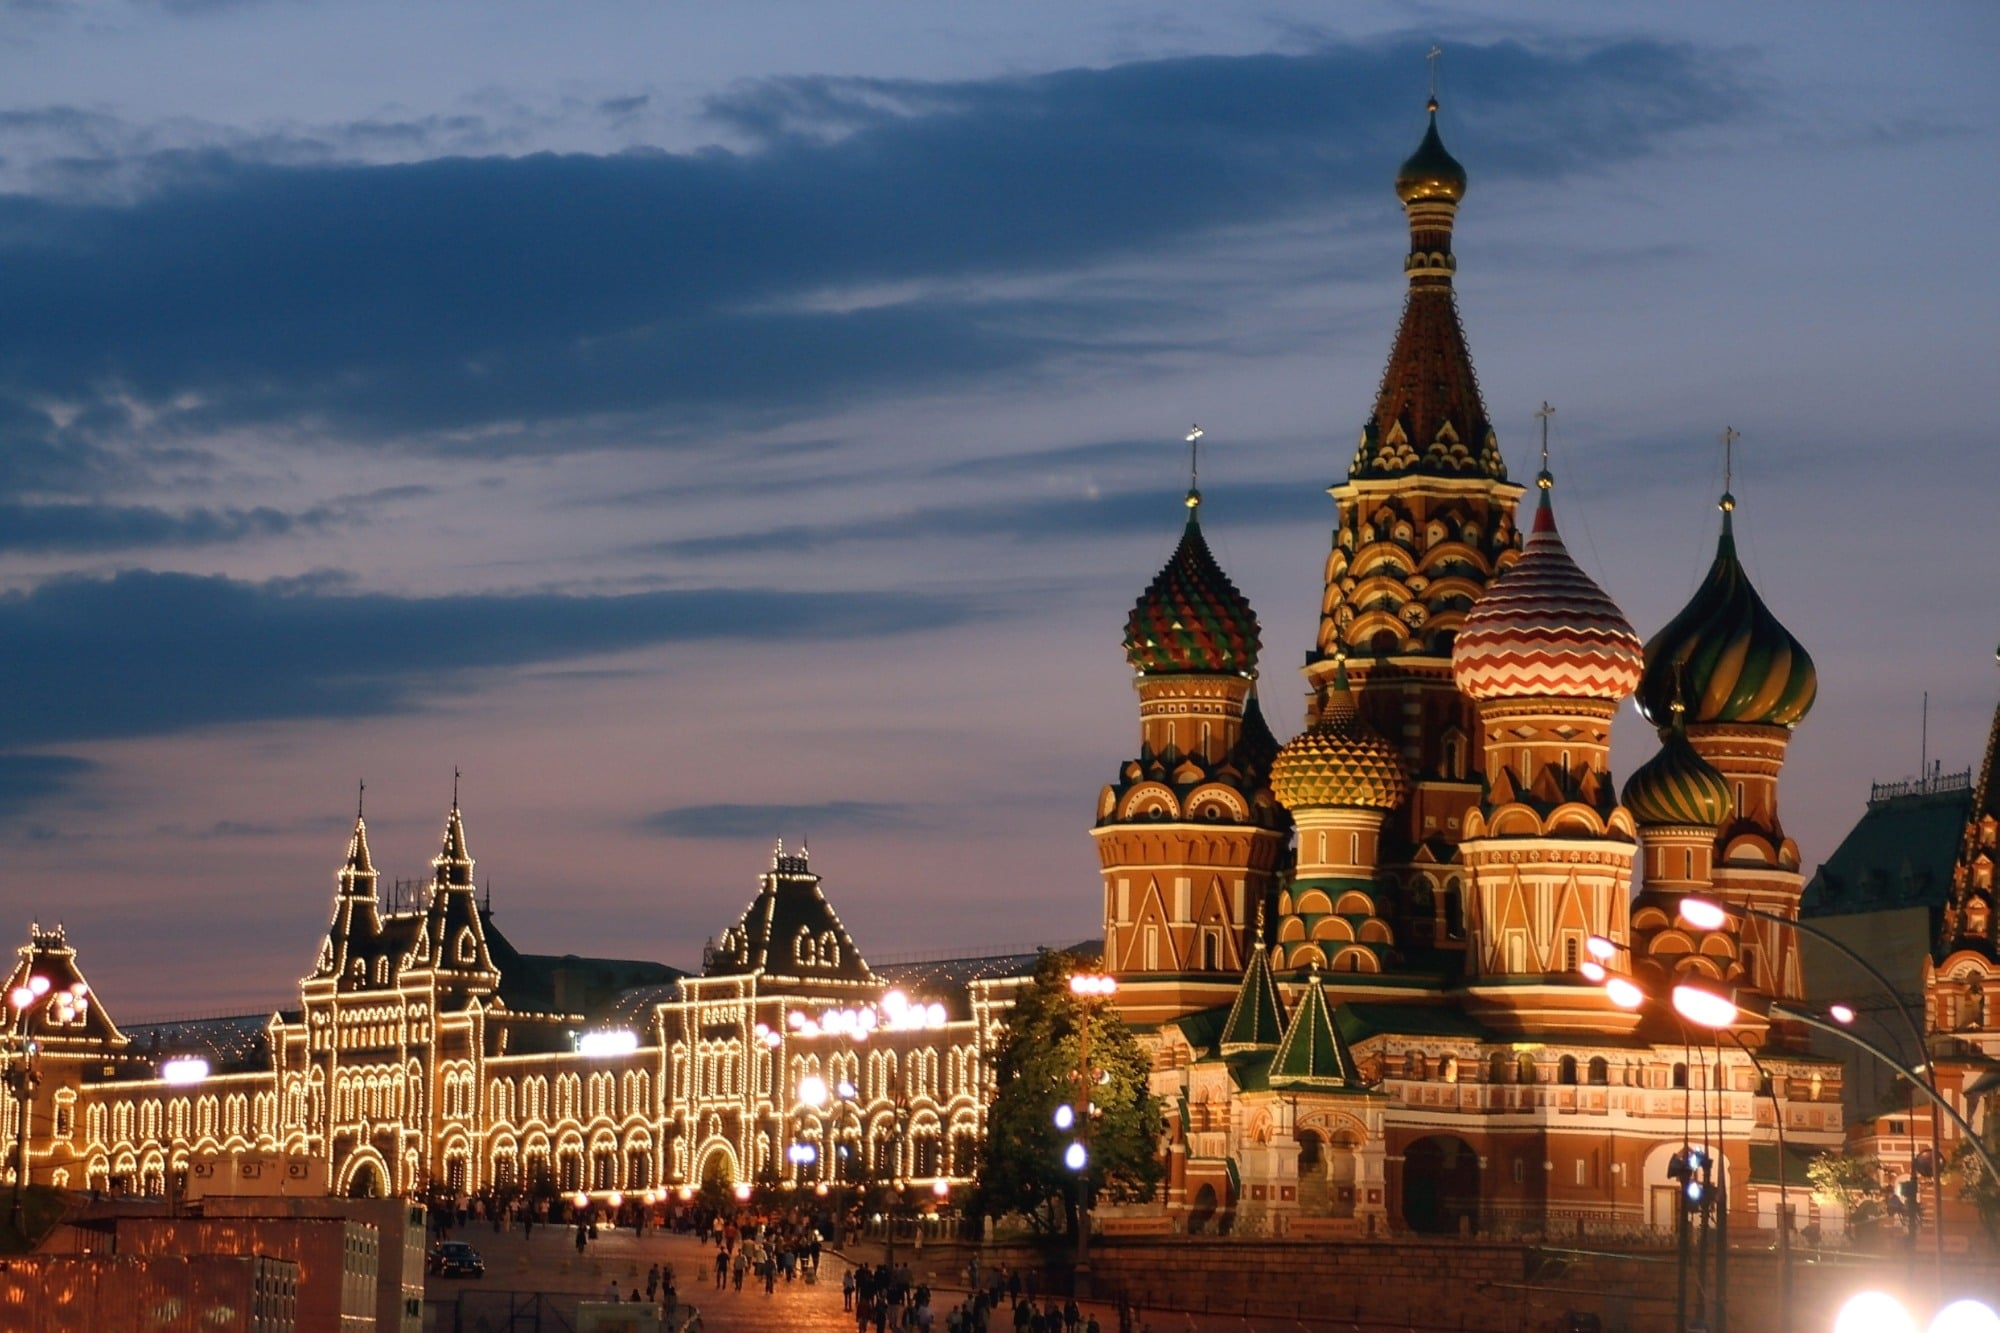 Catedrala Sfântul Vasile, seara